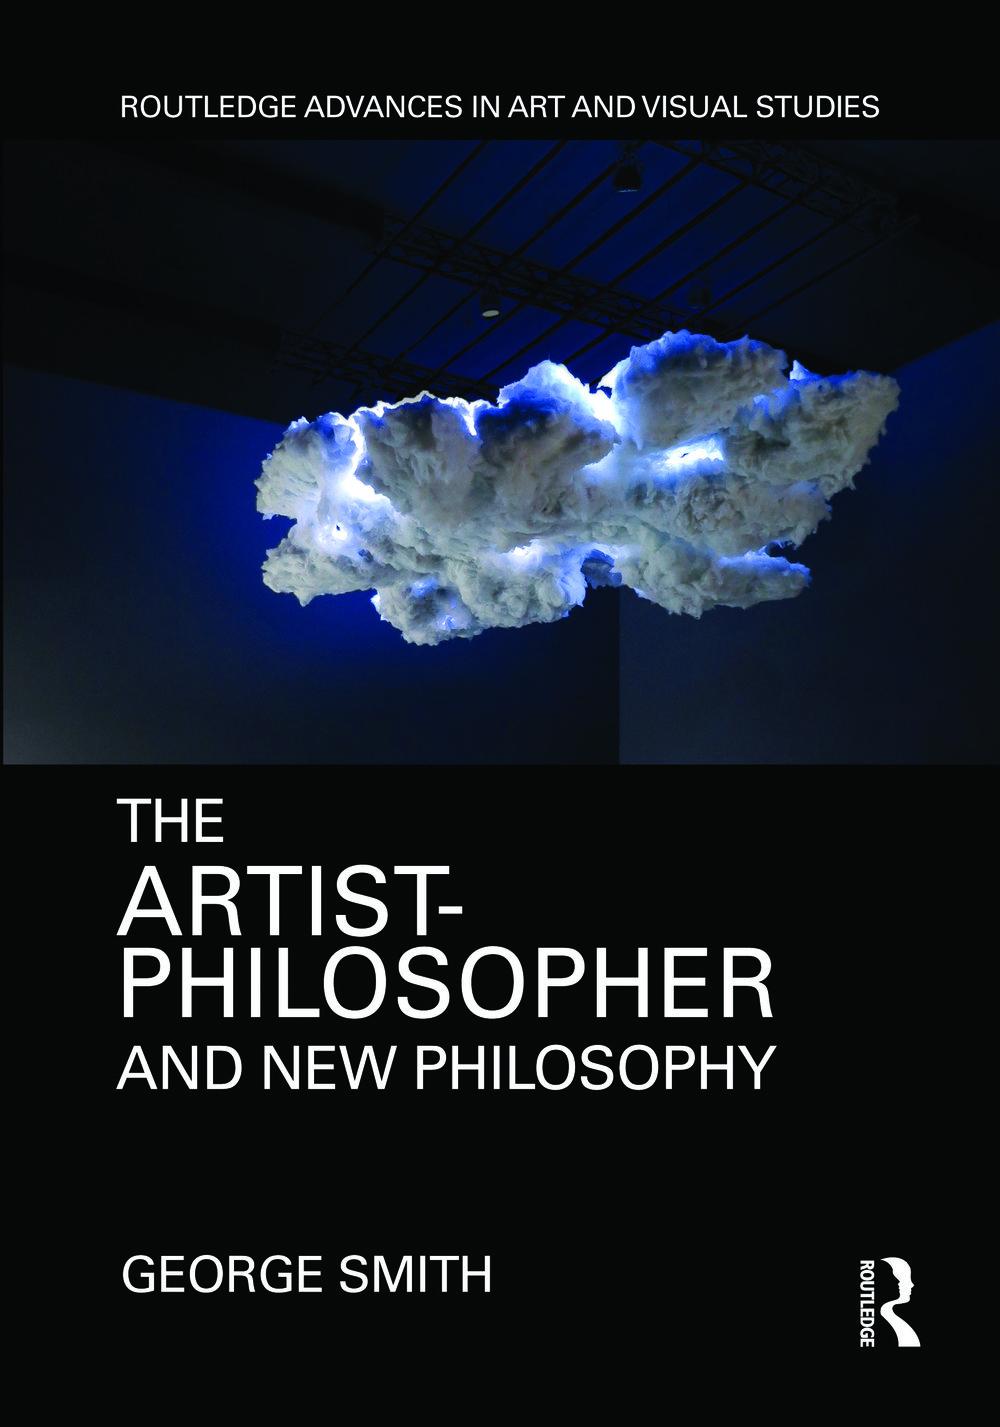 Smith Book cover. Art by Alfredo Jaar